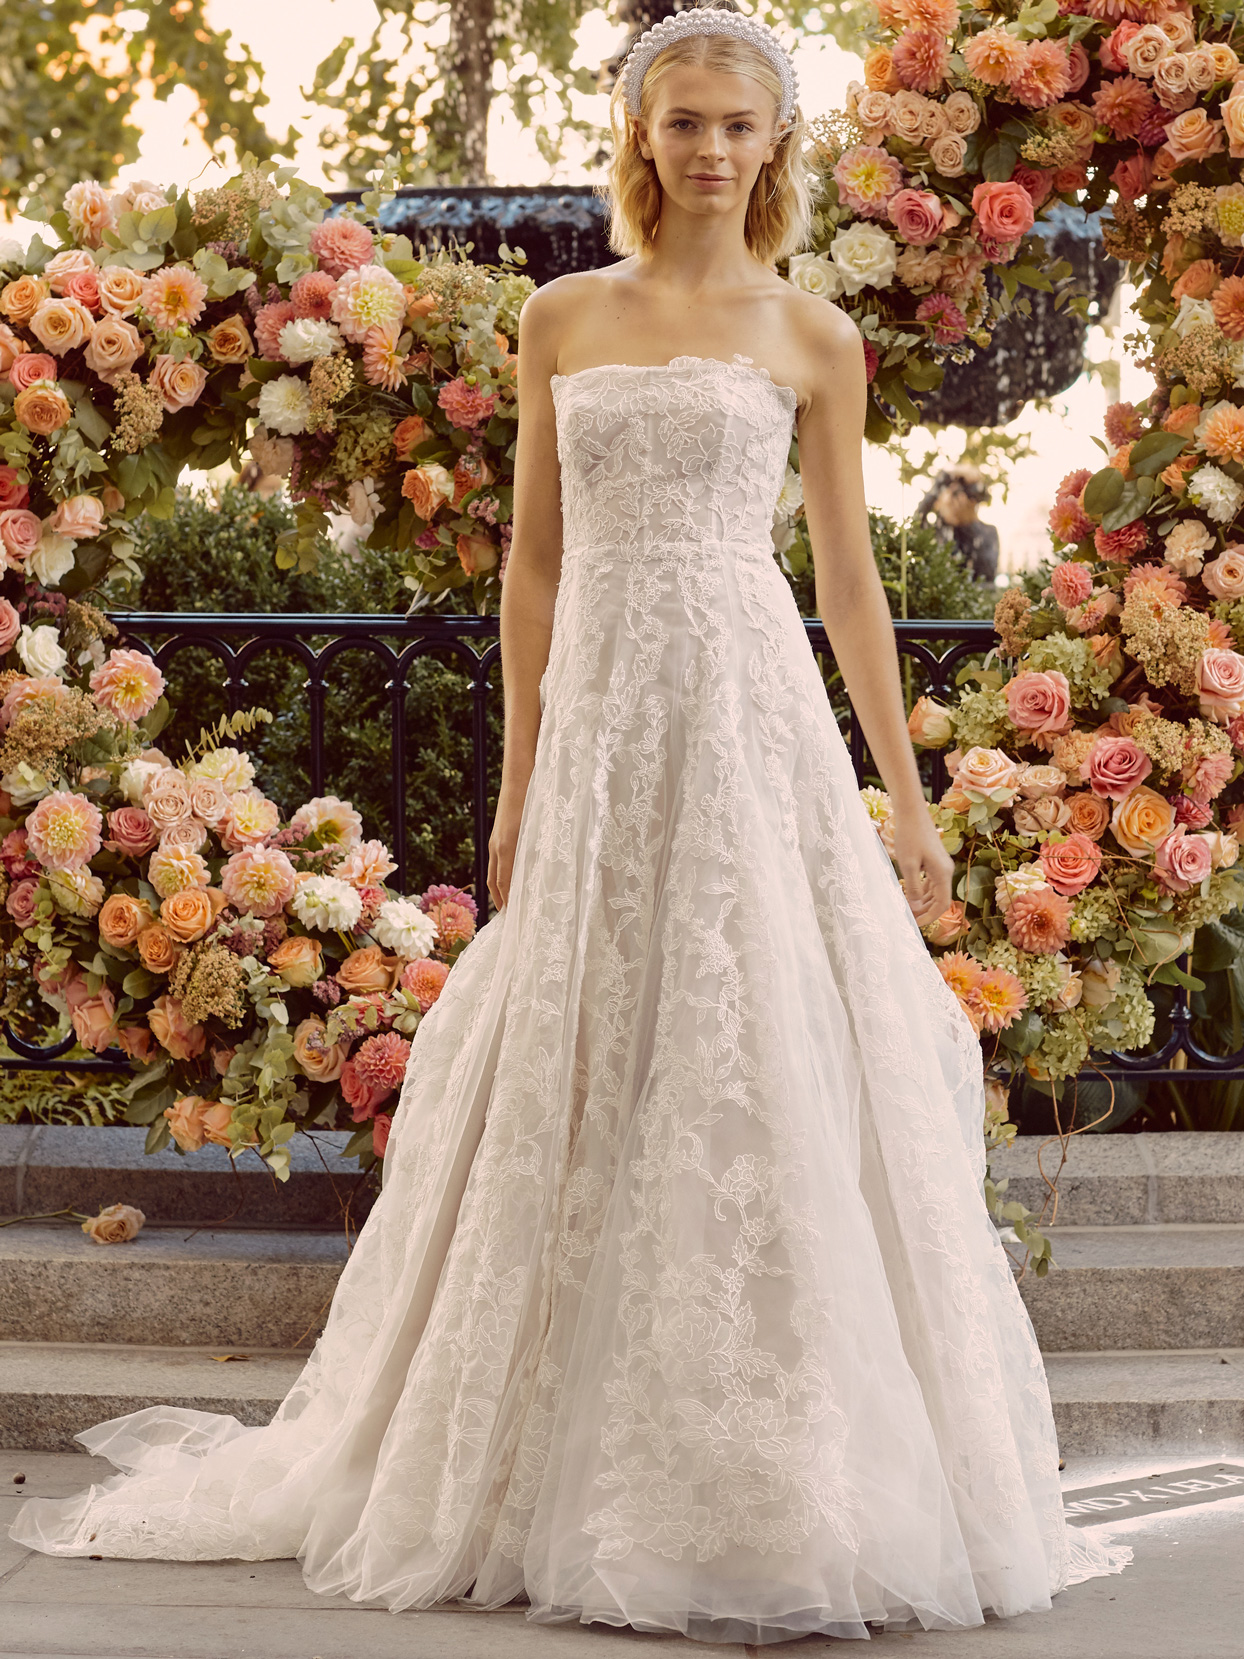 lela rose lace strapless a-line wedding dress fall 2020